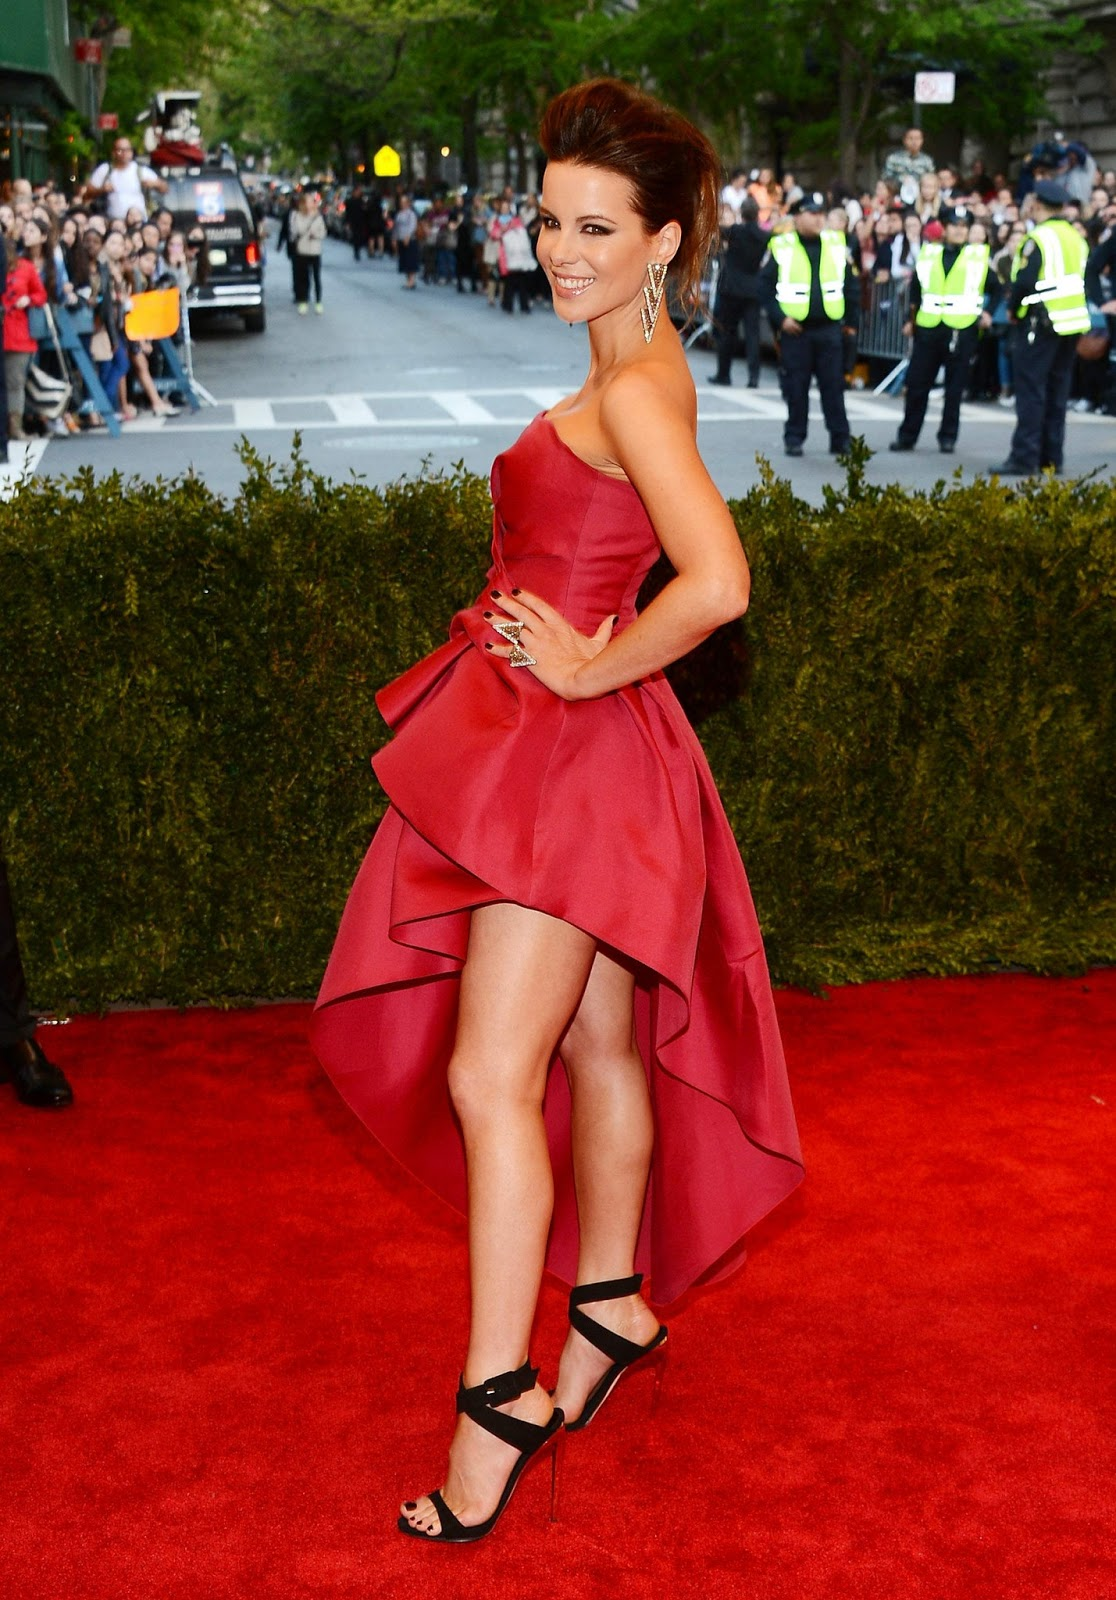 Kate Beckinsale - 2013 Costume Institute Gala | Just FAB